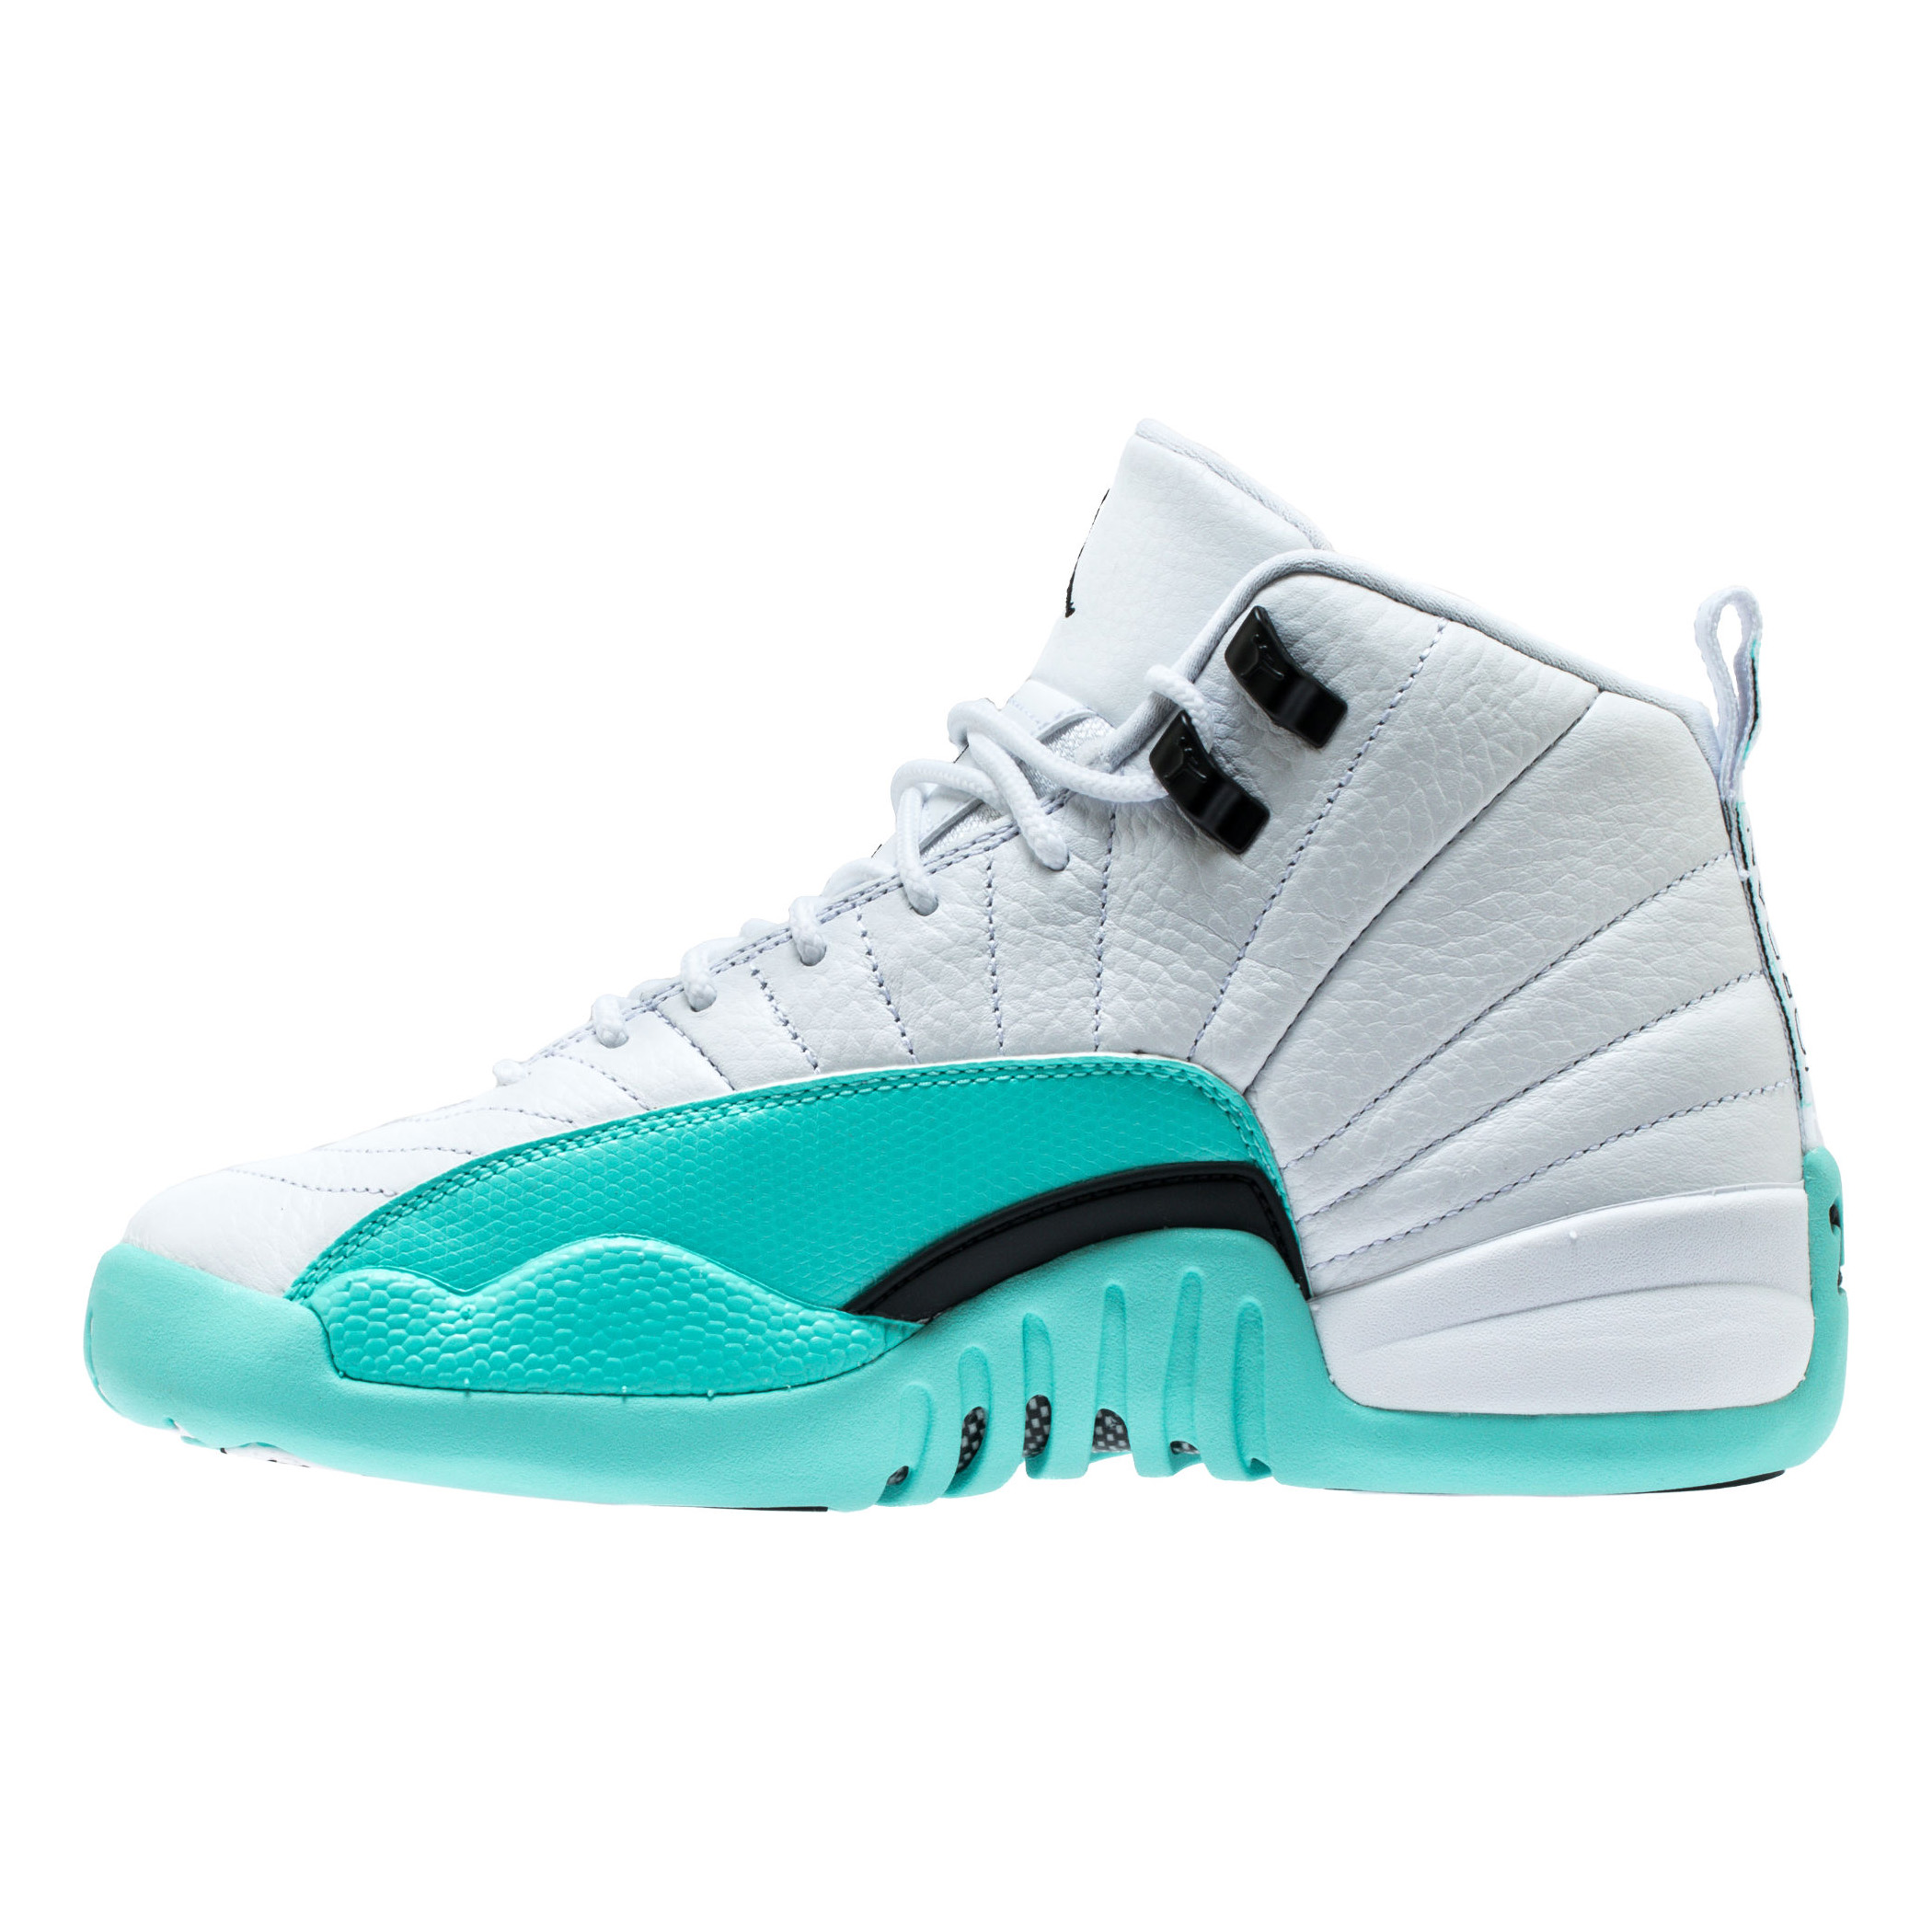 best website 12405 315cc Check Out This 'Light Aqua' Air Jordan 12 Retro - WearTesters